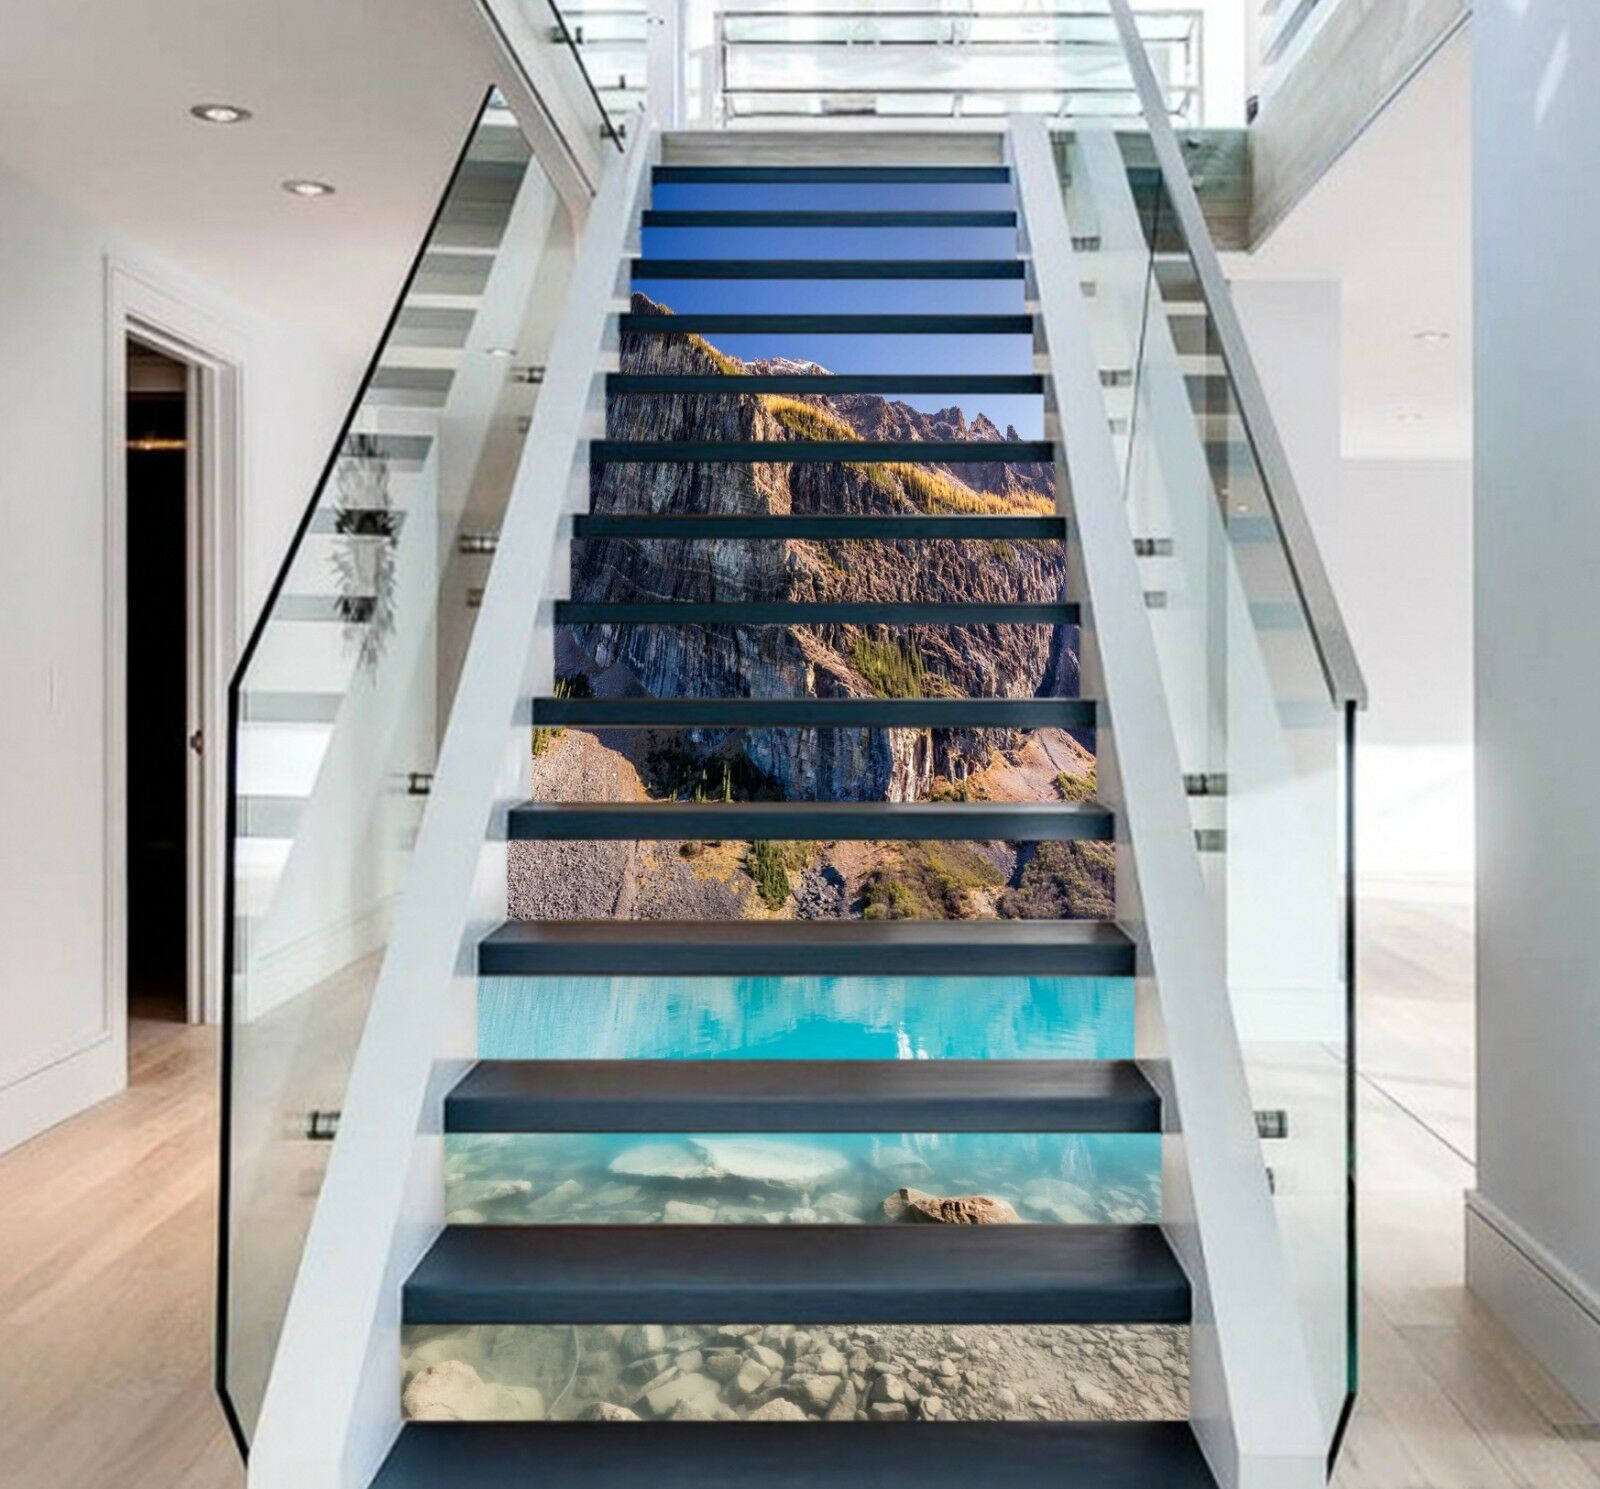 3D Lake Hills 9 Stair Risers Decoration Photo Mural Vinyl Decal WandPapier US